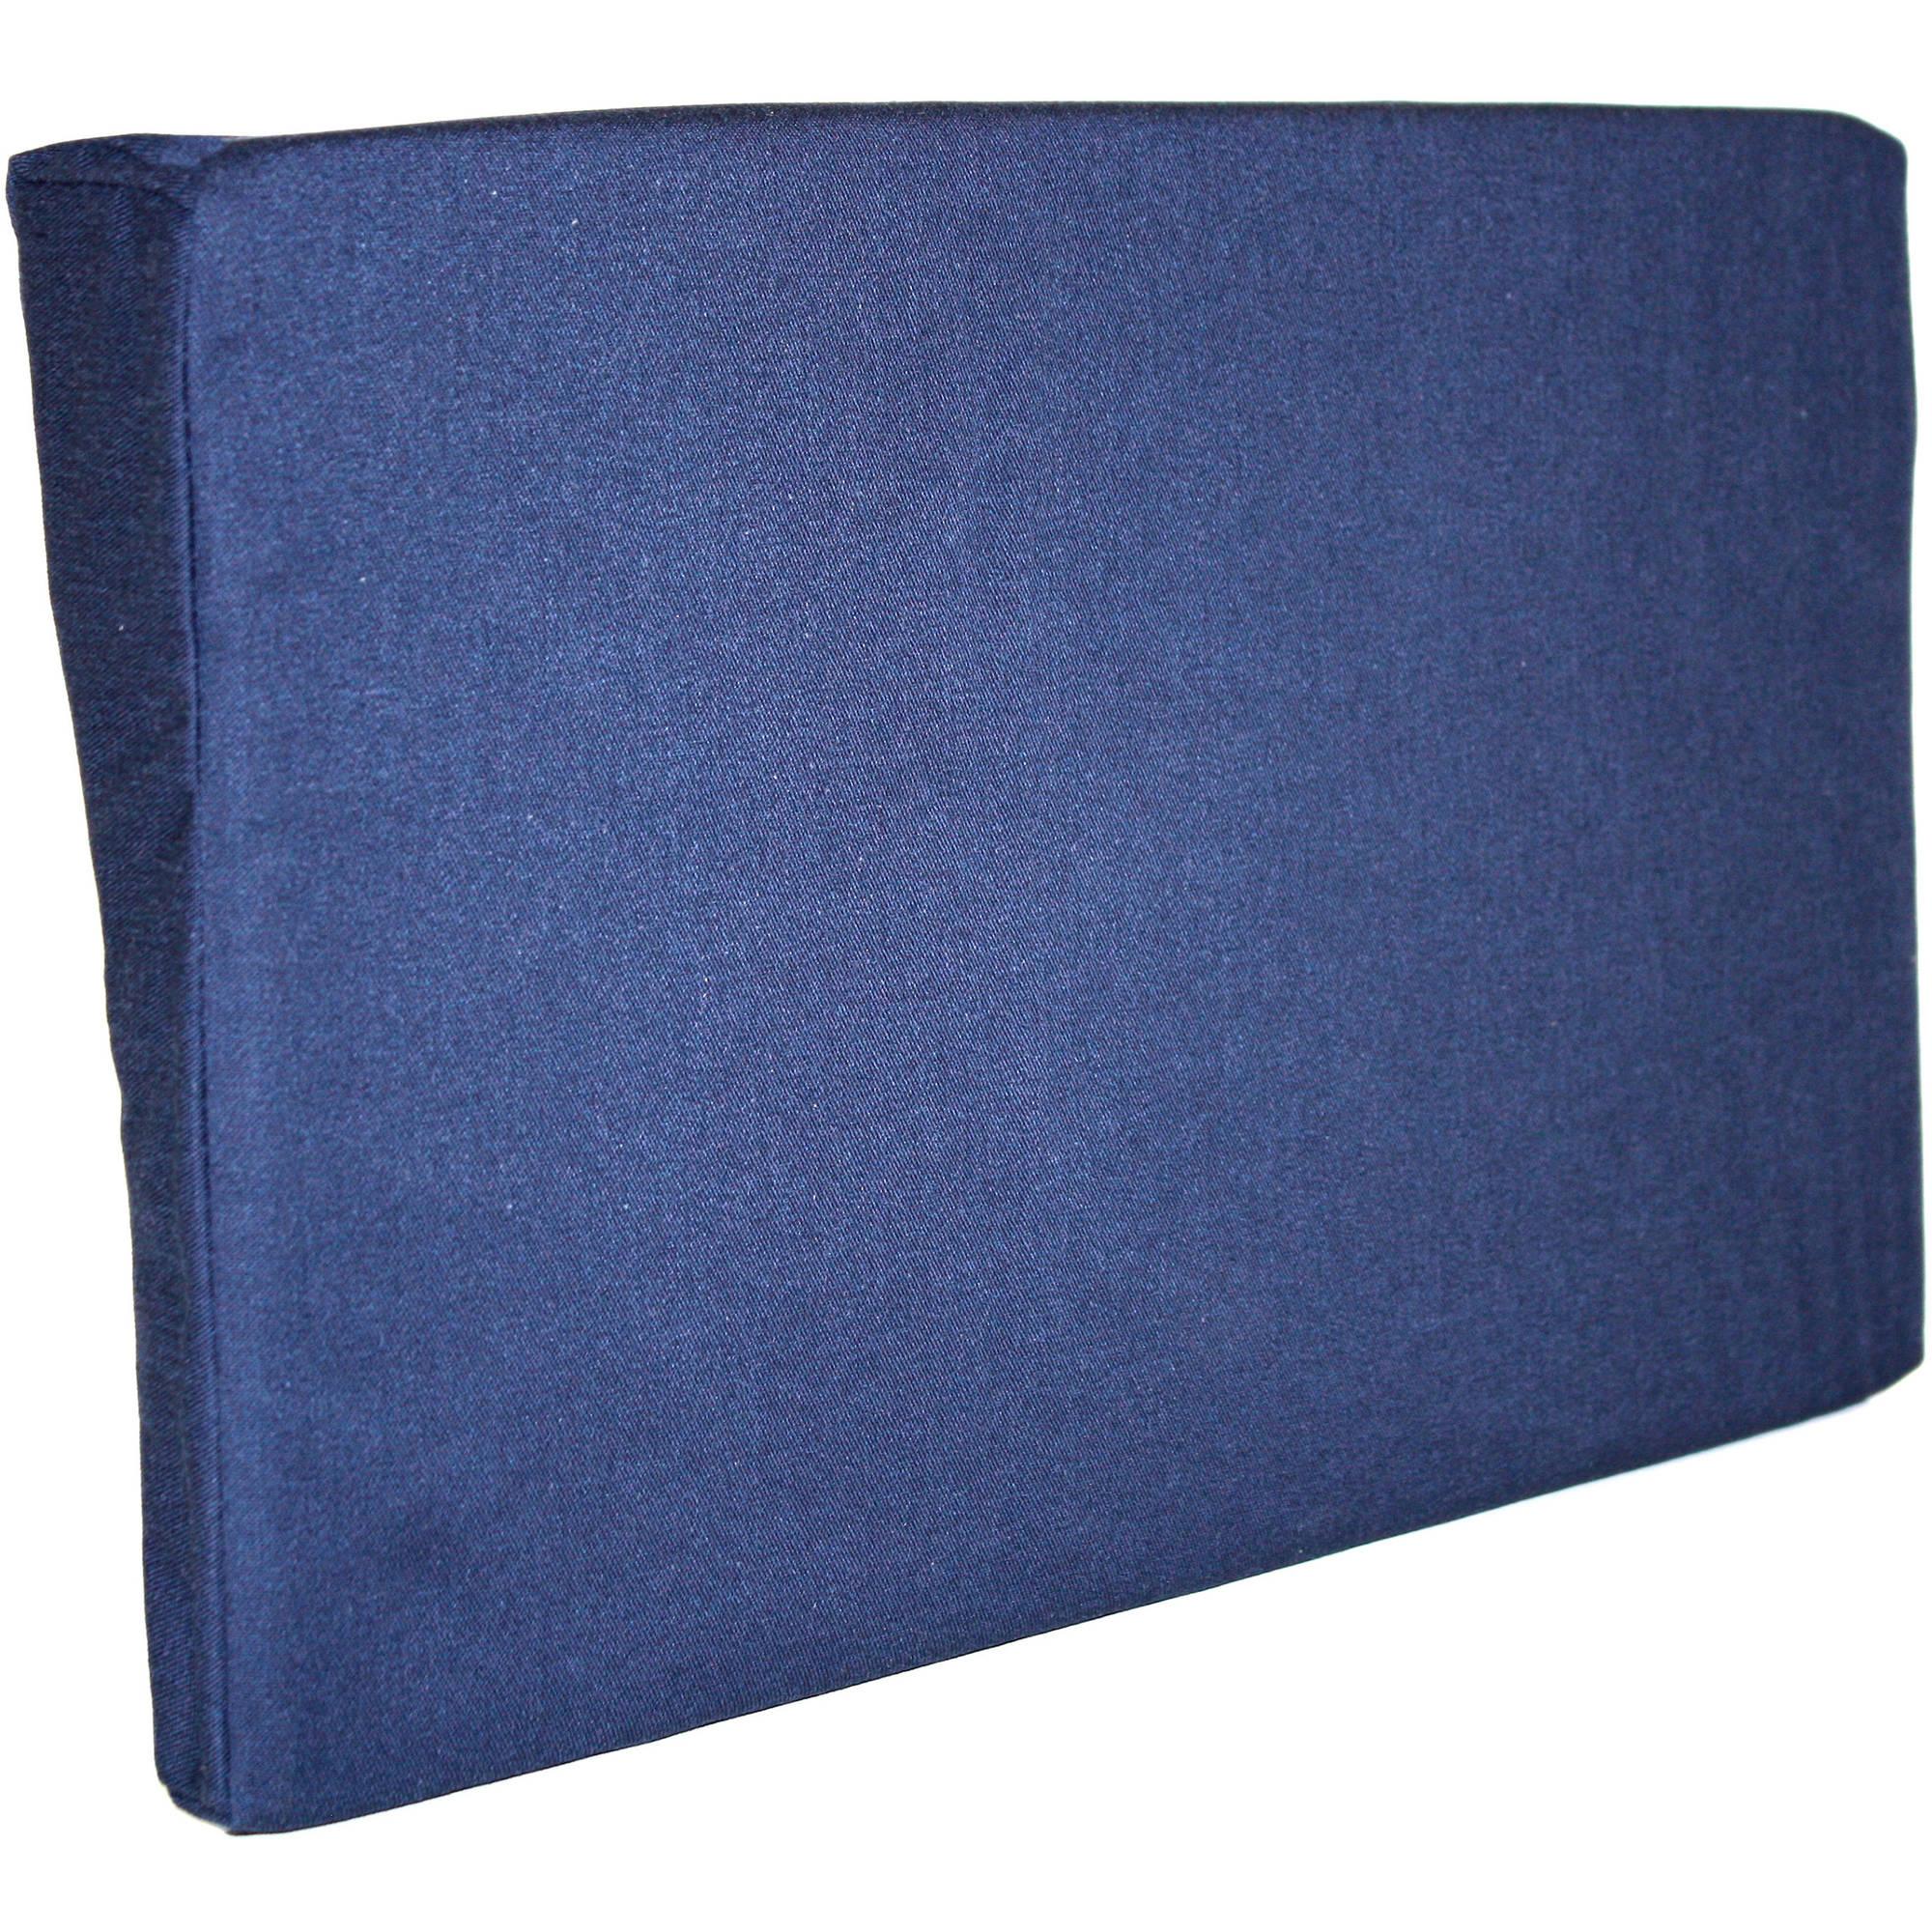 Jobri BetterPosture Small Seat Wedge Blue  Walmartcom